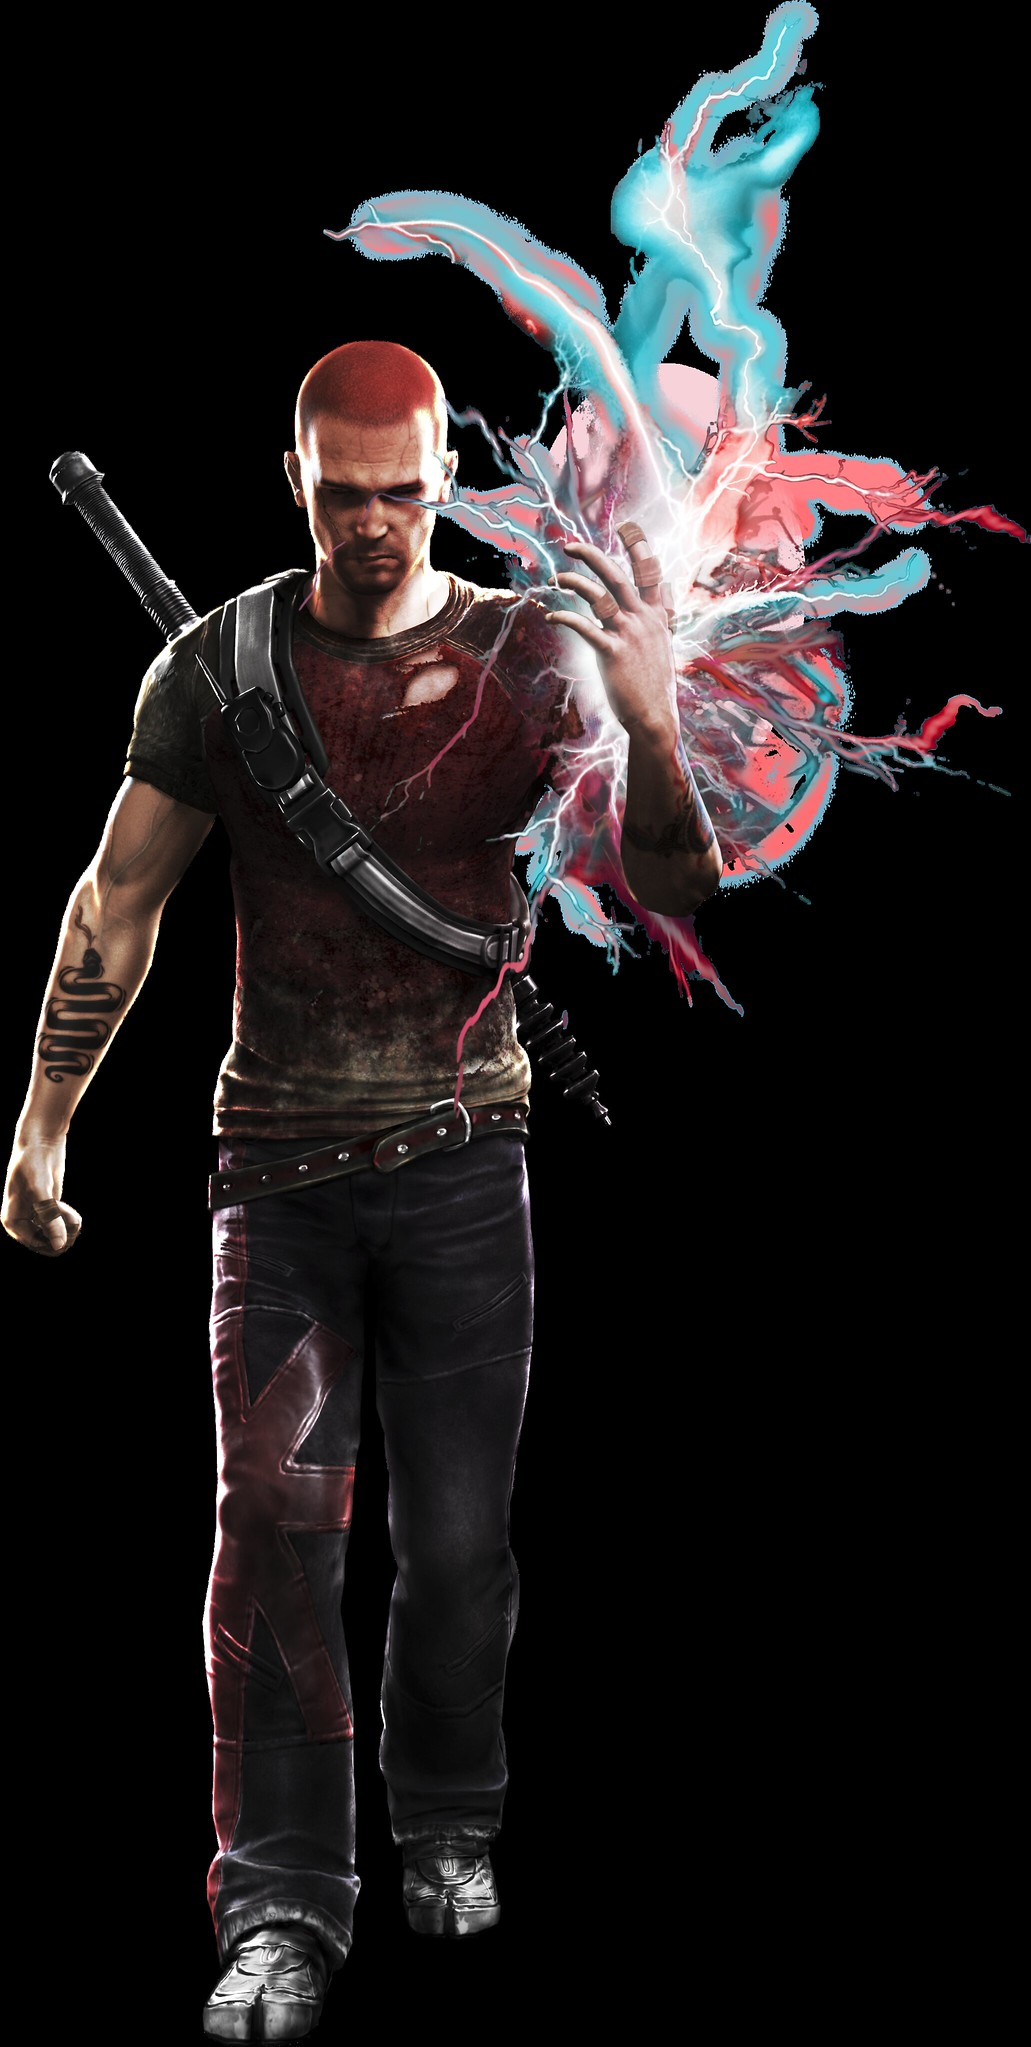 [GAME] PlayStation All-Stars Battle Royale - Smash Bros da SONY, começa a se revelar! 7881502494_d07b0570b1_k